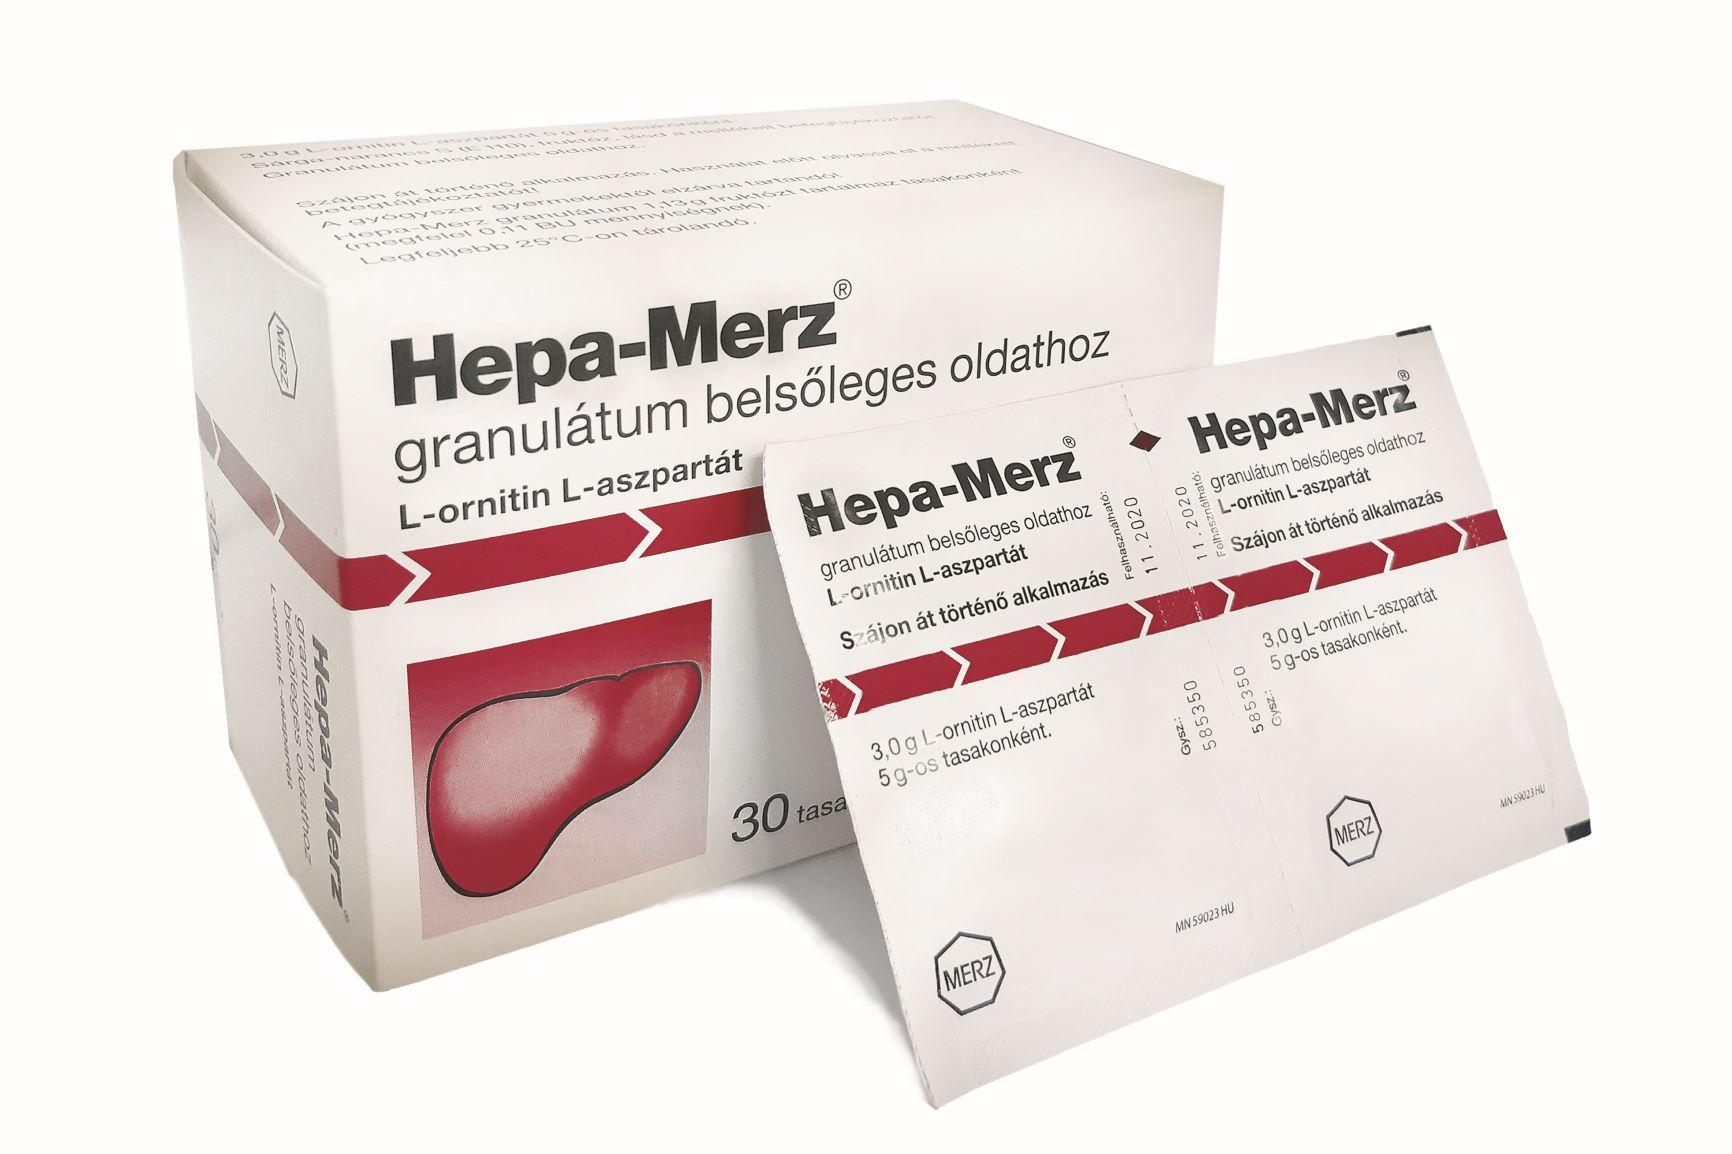 Hepa-Merz granulátum belsőleges oldathoz 30x5g